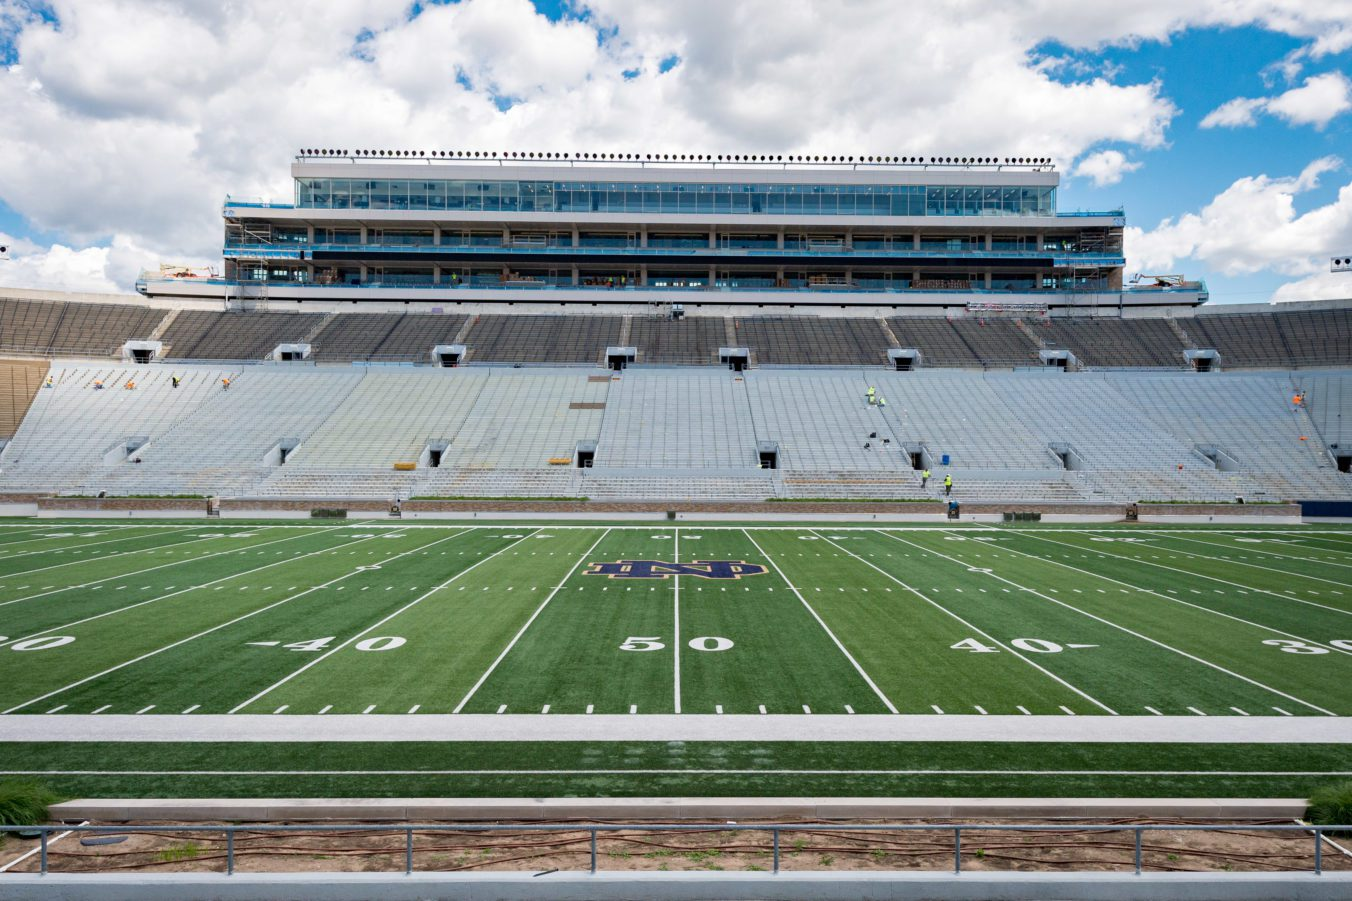 University of Notre Dame Campus Crossroads Football Field